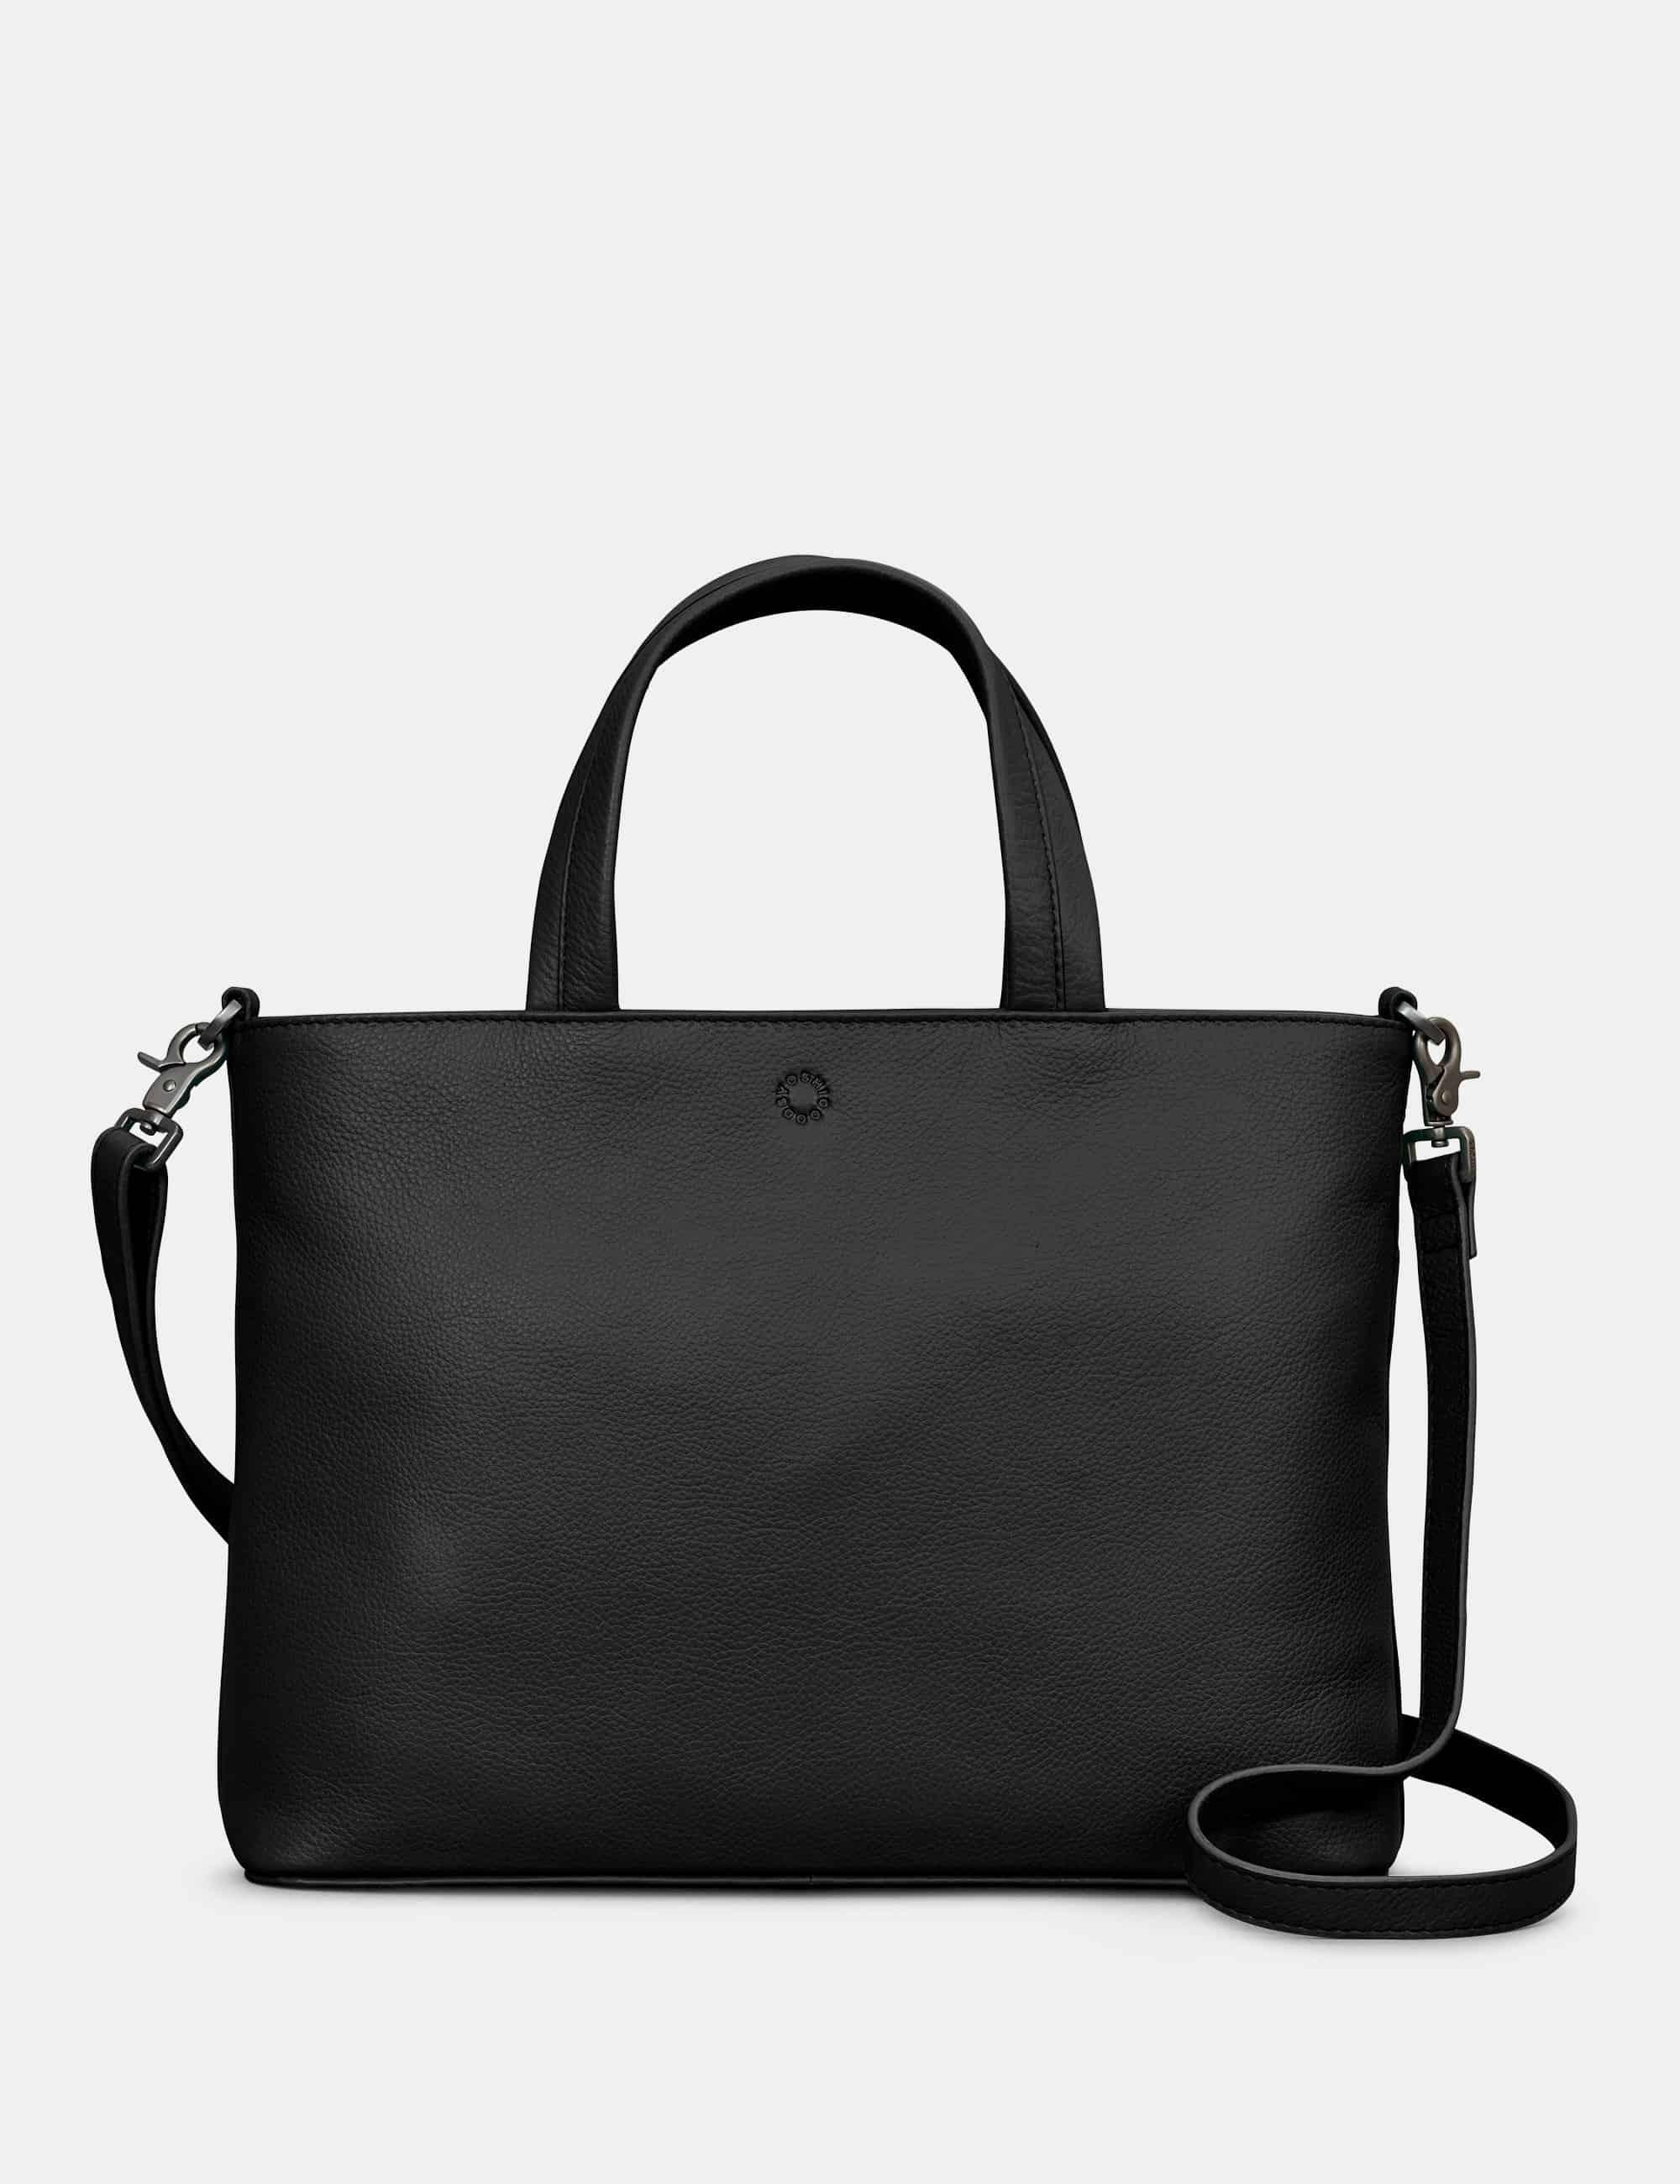 yoshi hampton leather handbag